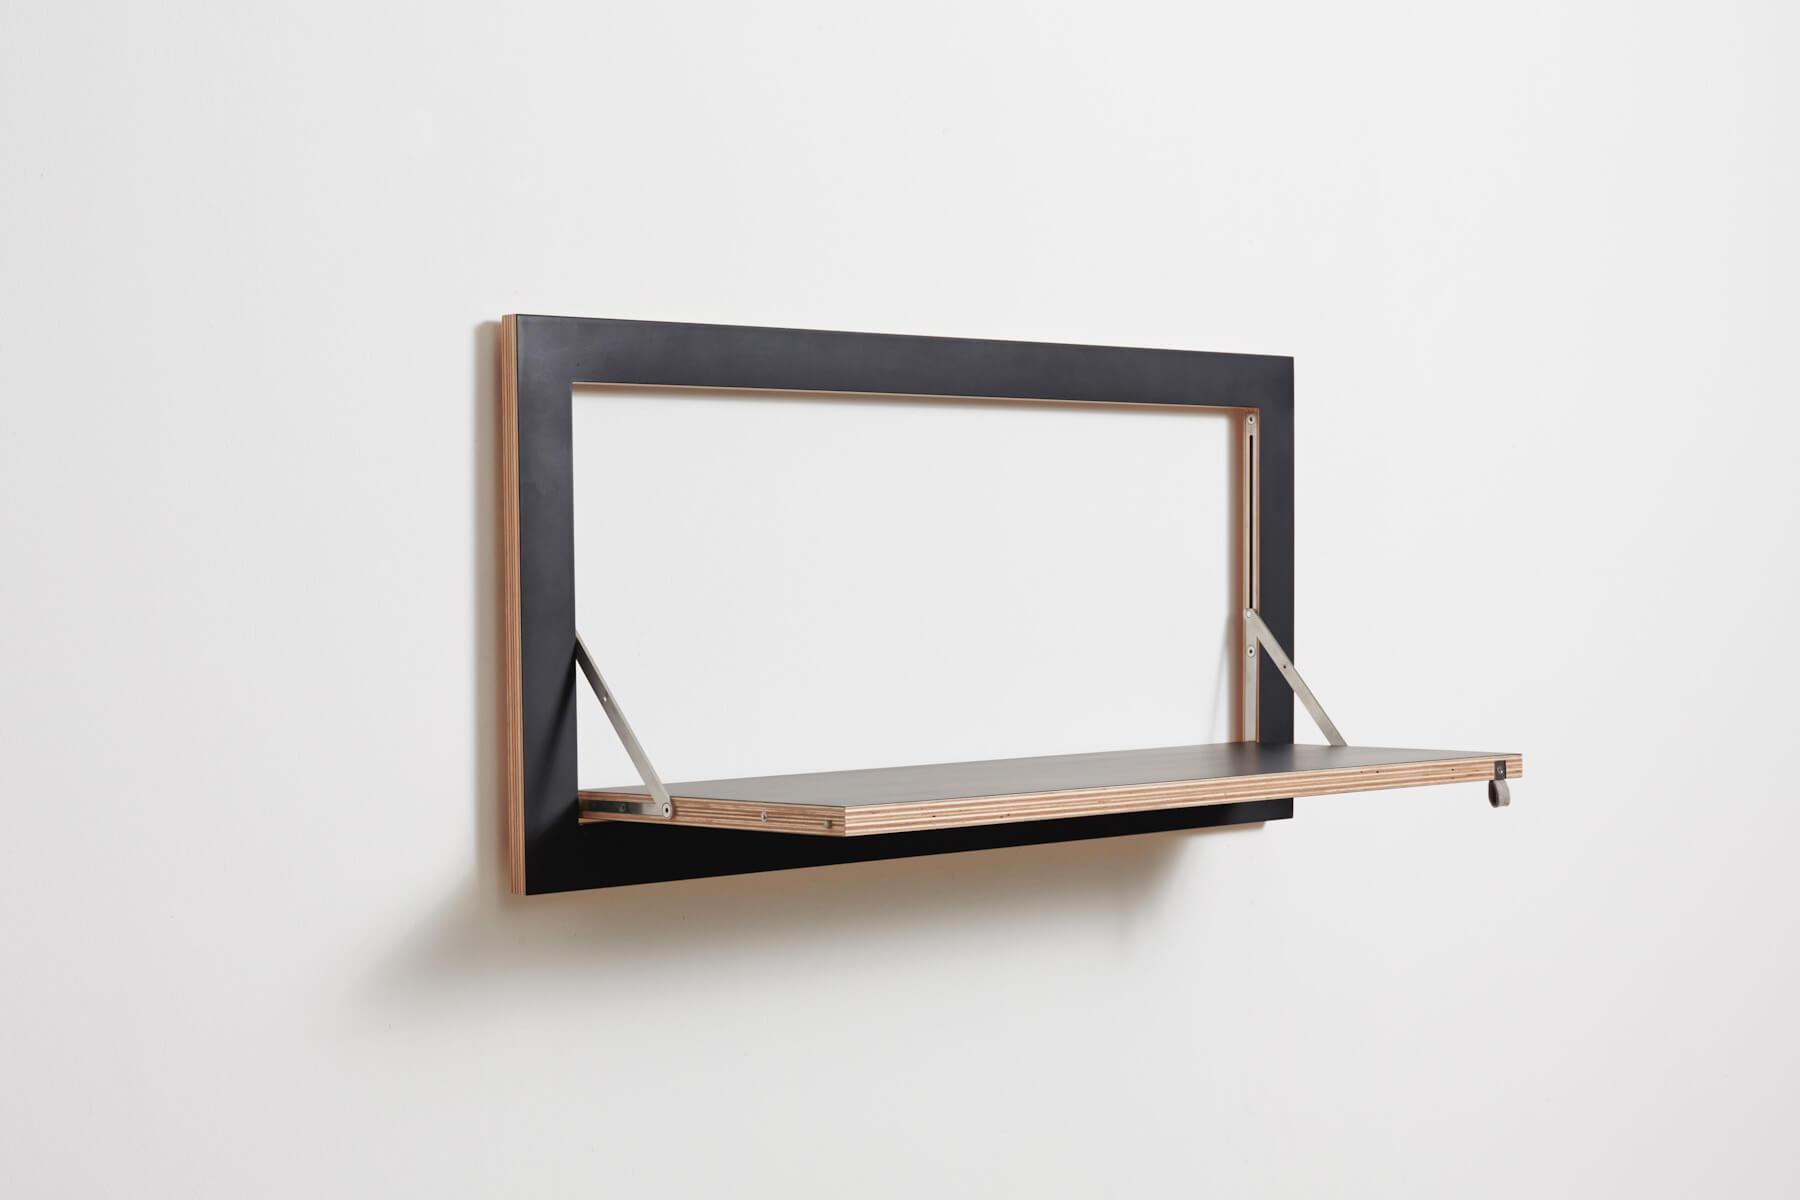 Funktionelles modernes wandregal fl pps 80x40 cm in for Sideboard 80 x 40